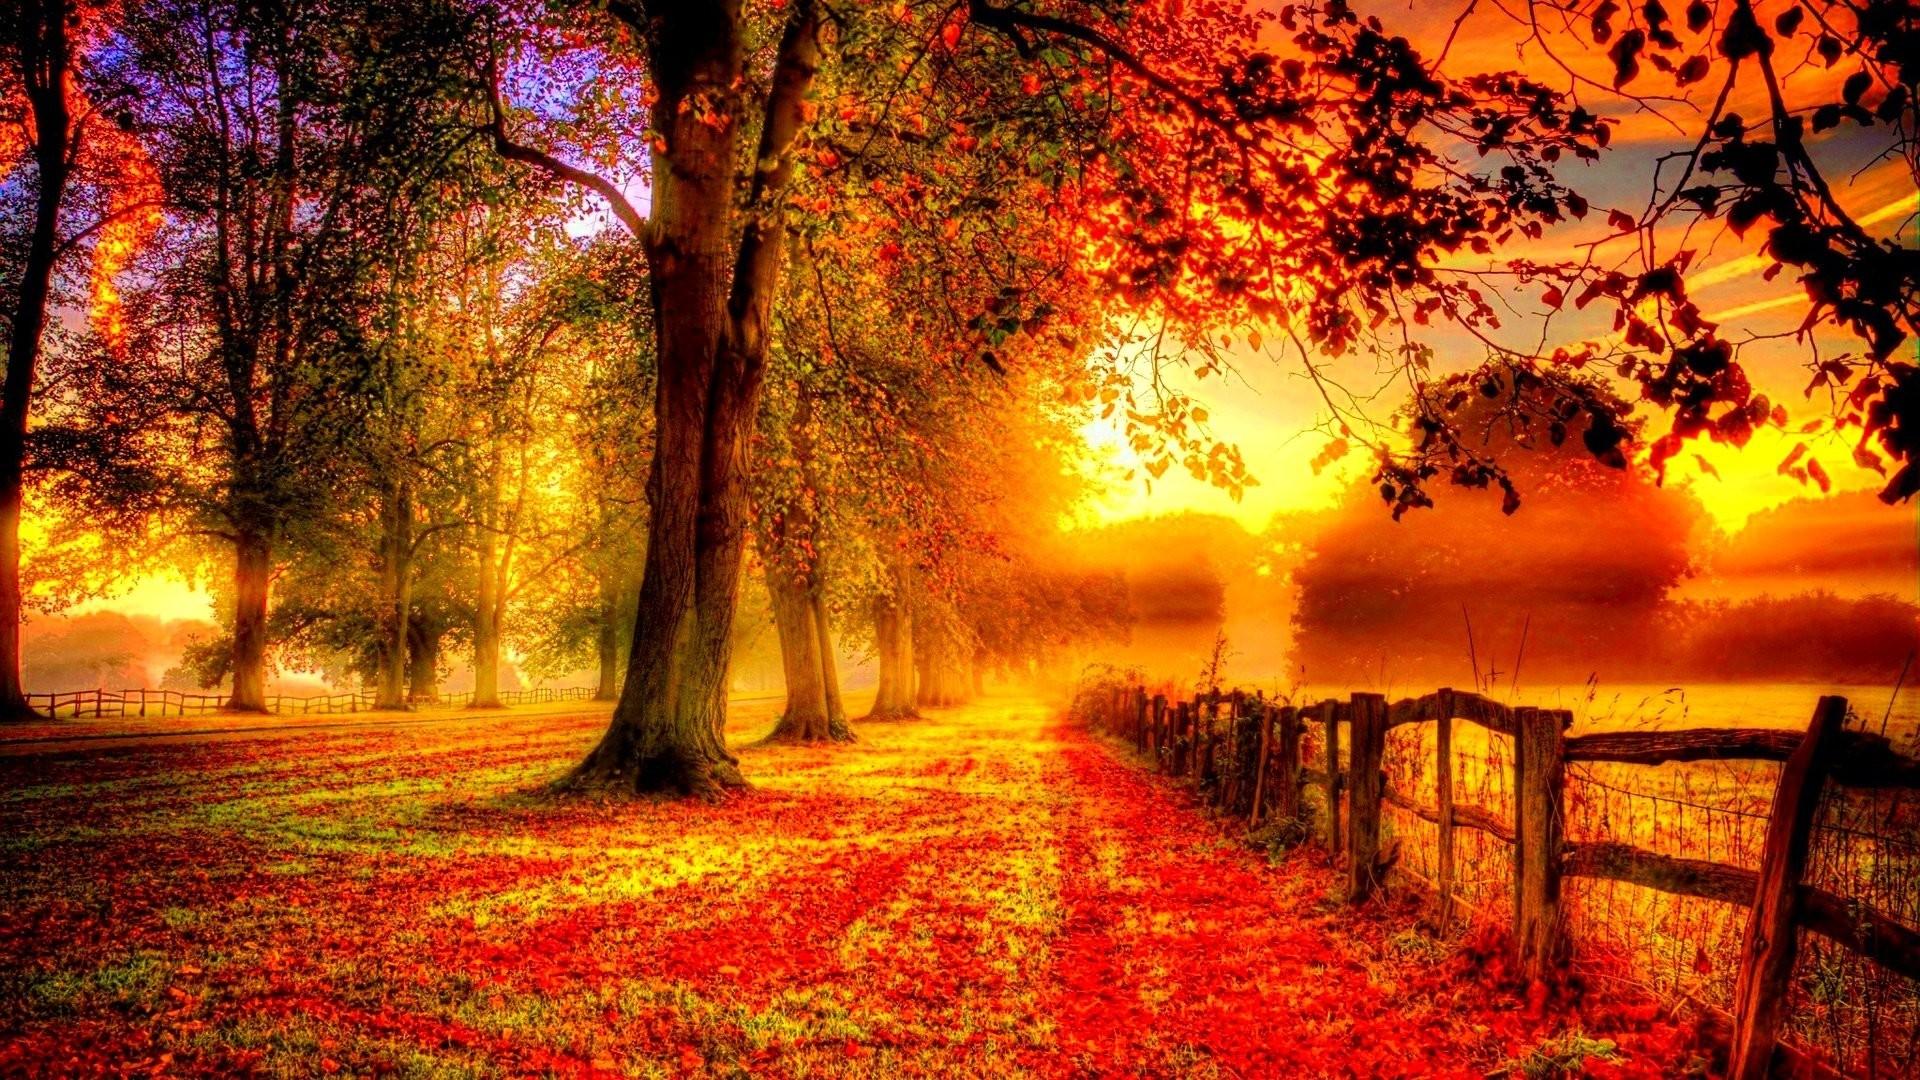 Iphone 8 Wallpaper: IPhone 6 Autumn Wallpaper (87+ Images